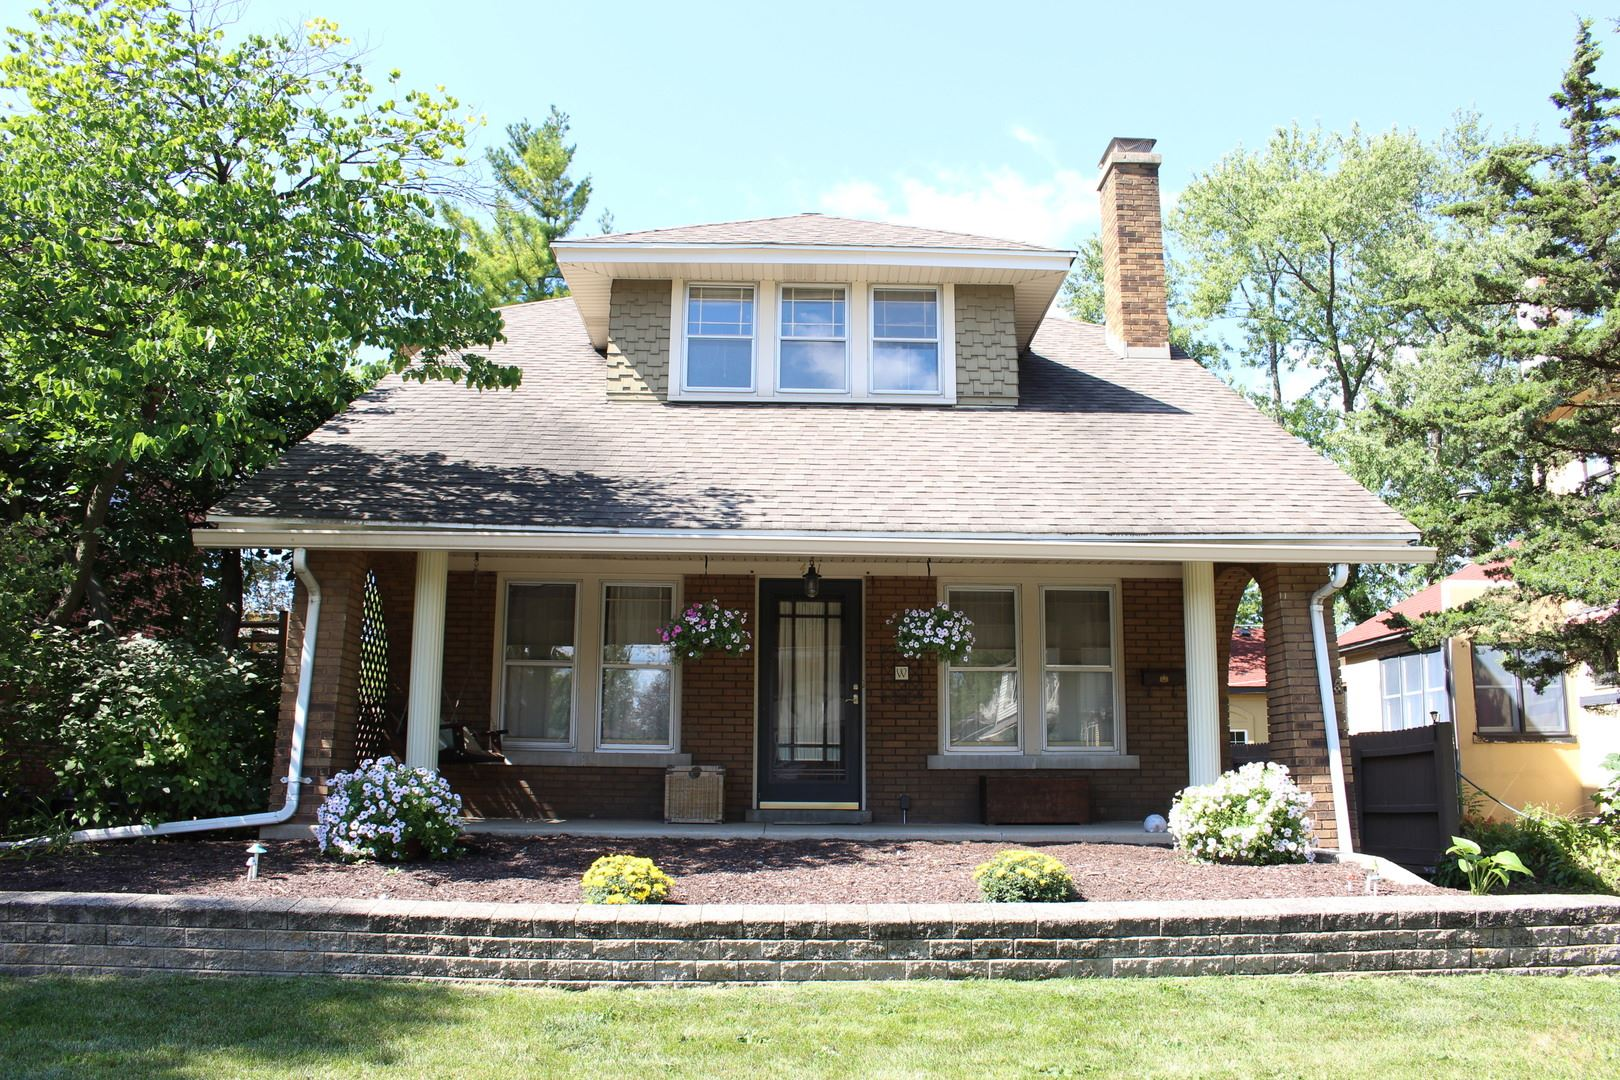 Photo of 421 Cornelia Street, Joliet, IL 60435 (MLS # 10856269)